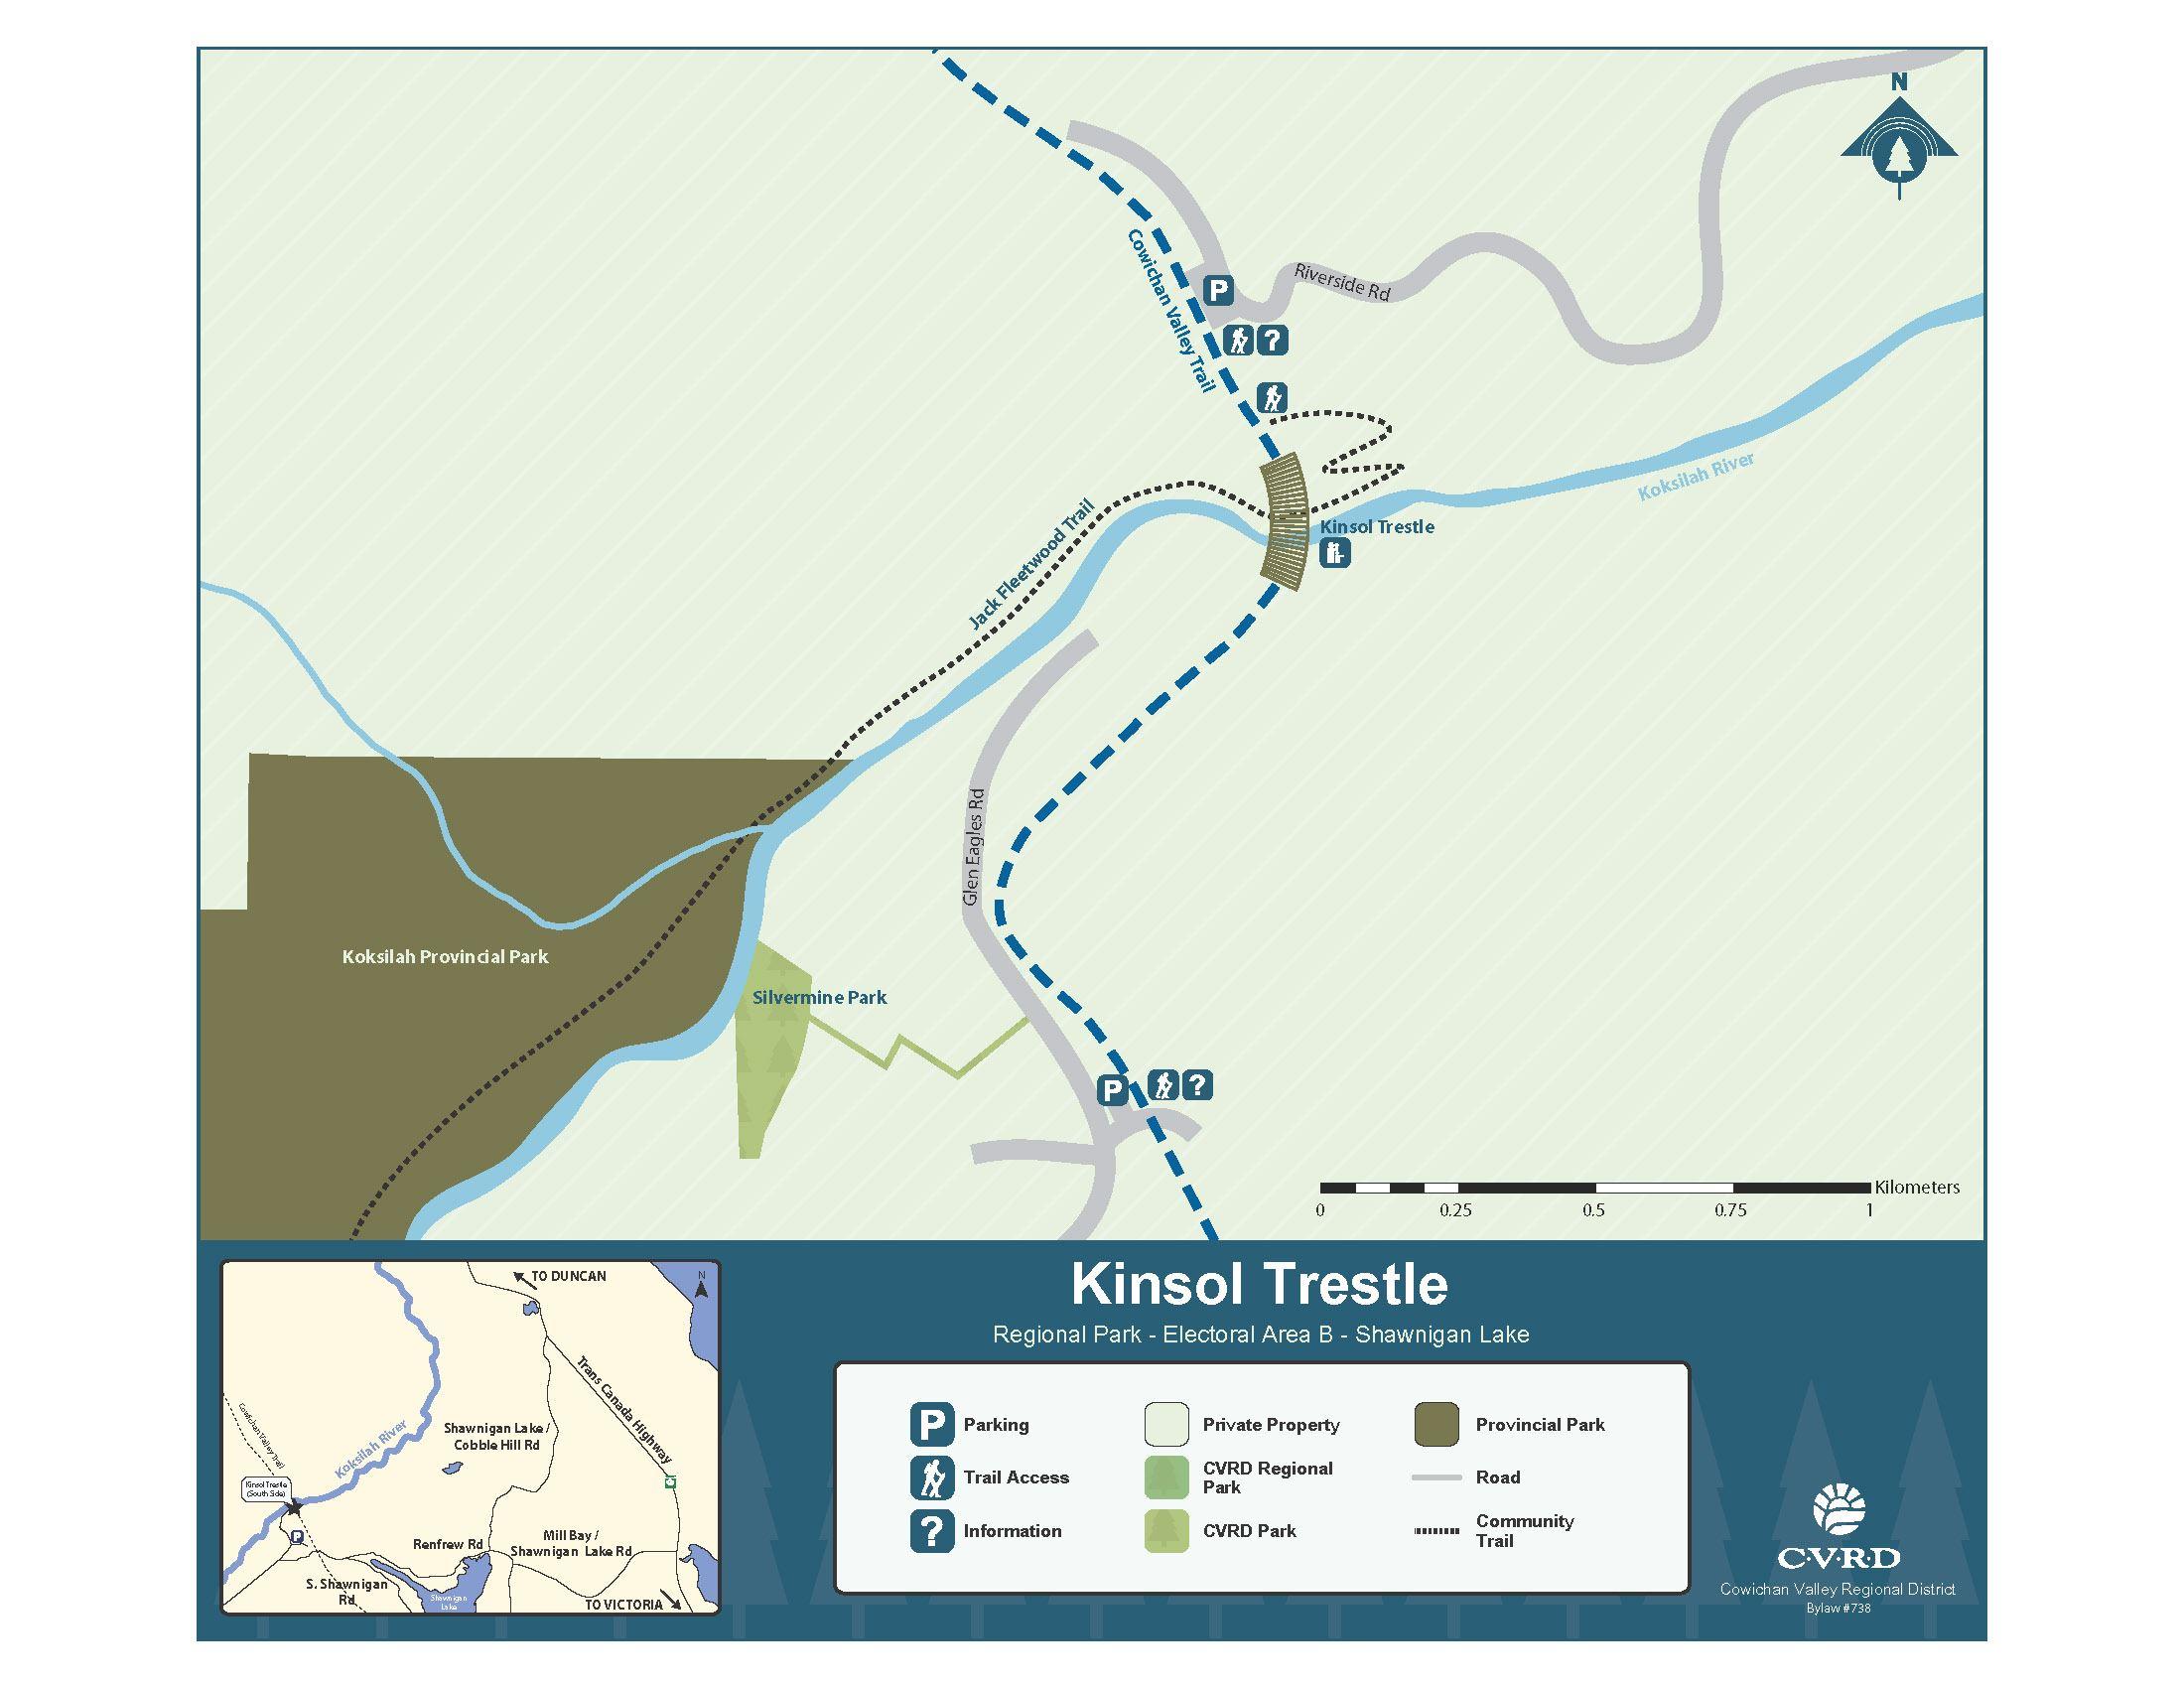 Kinsol Trestle - Cowichan Valley